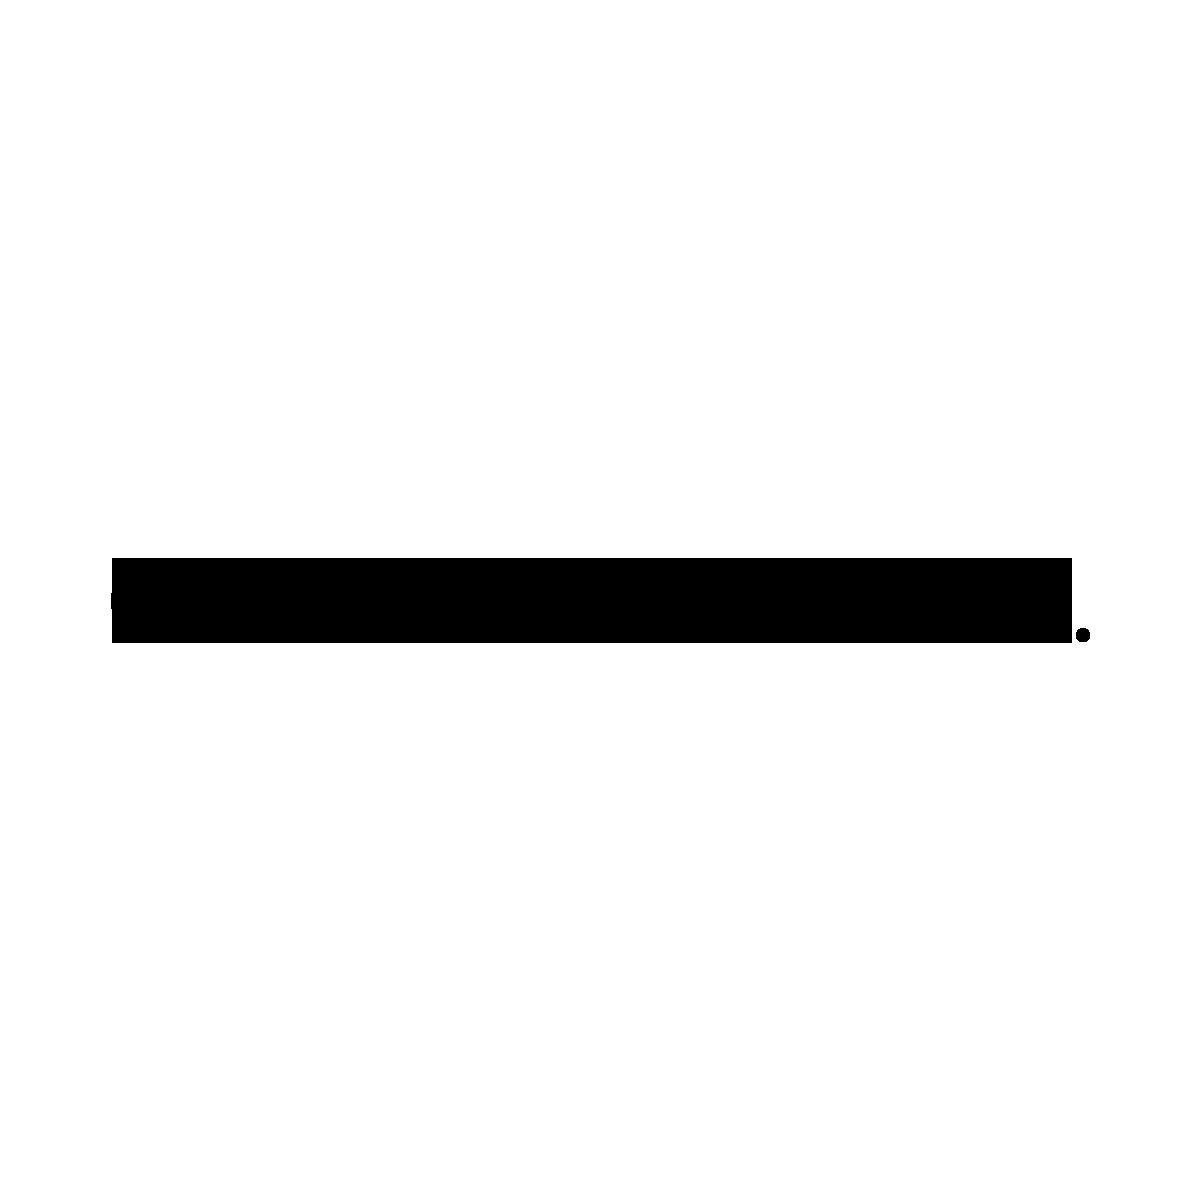 YARA slipper 3 cm leather lilla